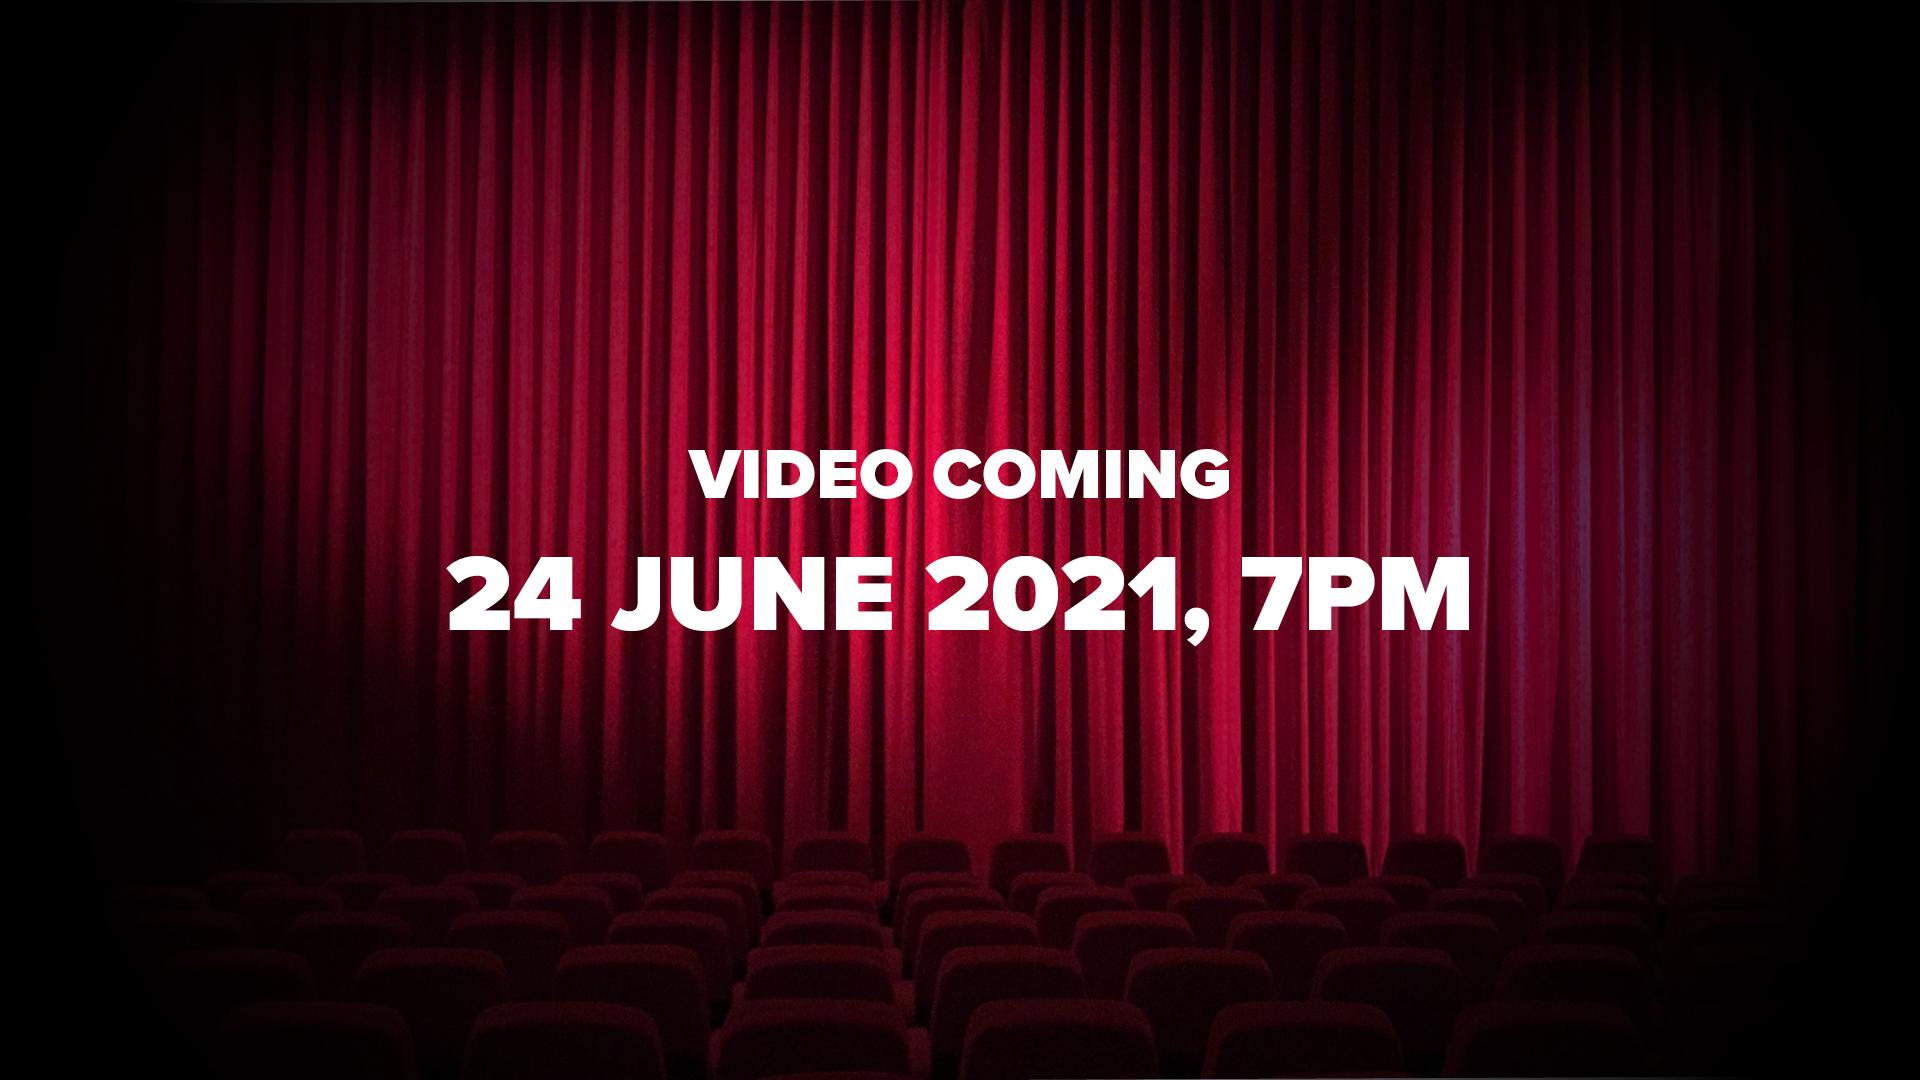 Video Coming - 24 June 2021, 7pm